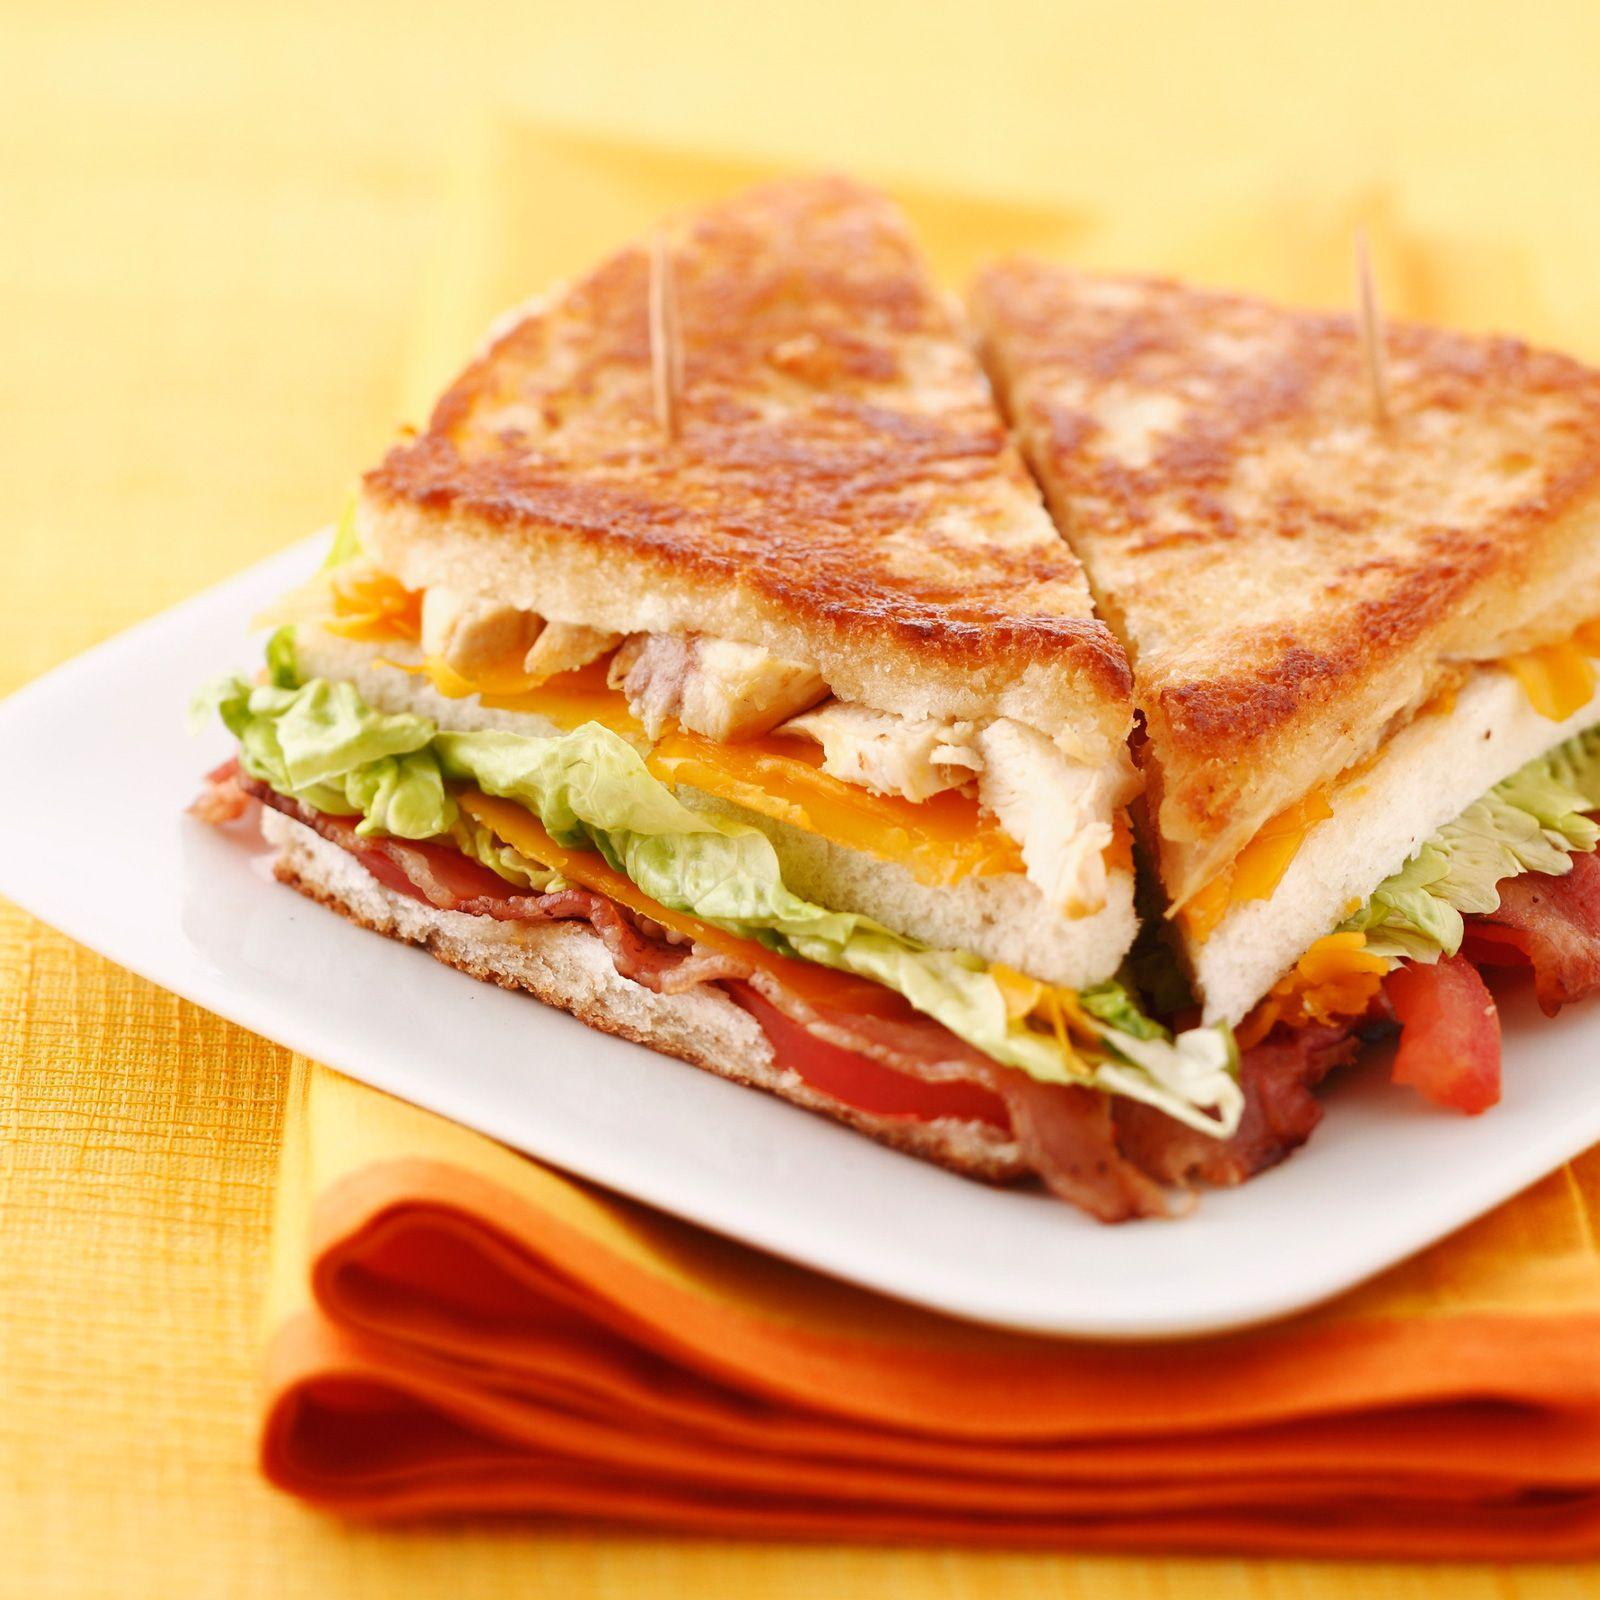 Club Sandwich Toaste Poulet Cheddar Bacon Tomate Recette Repas